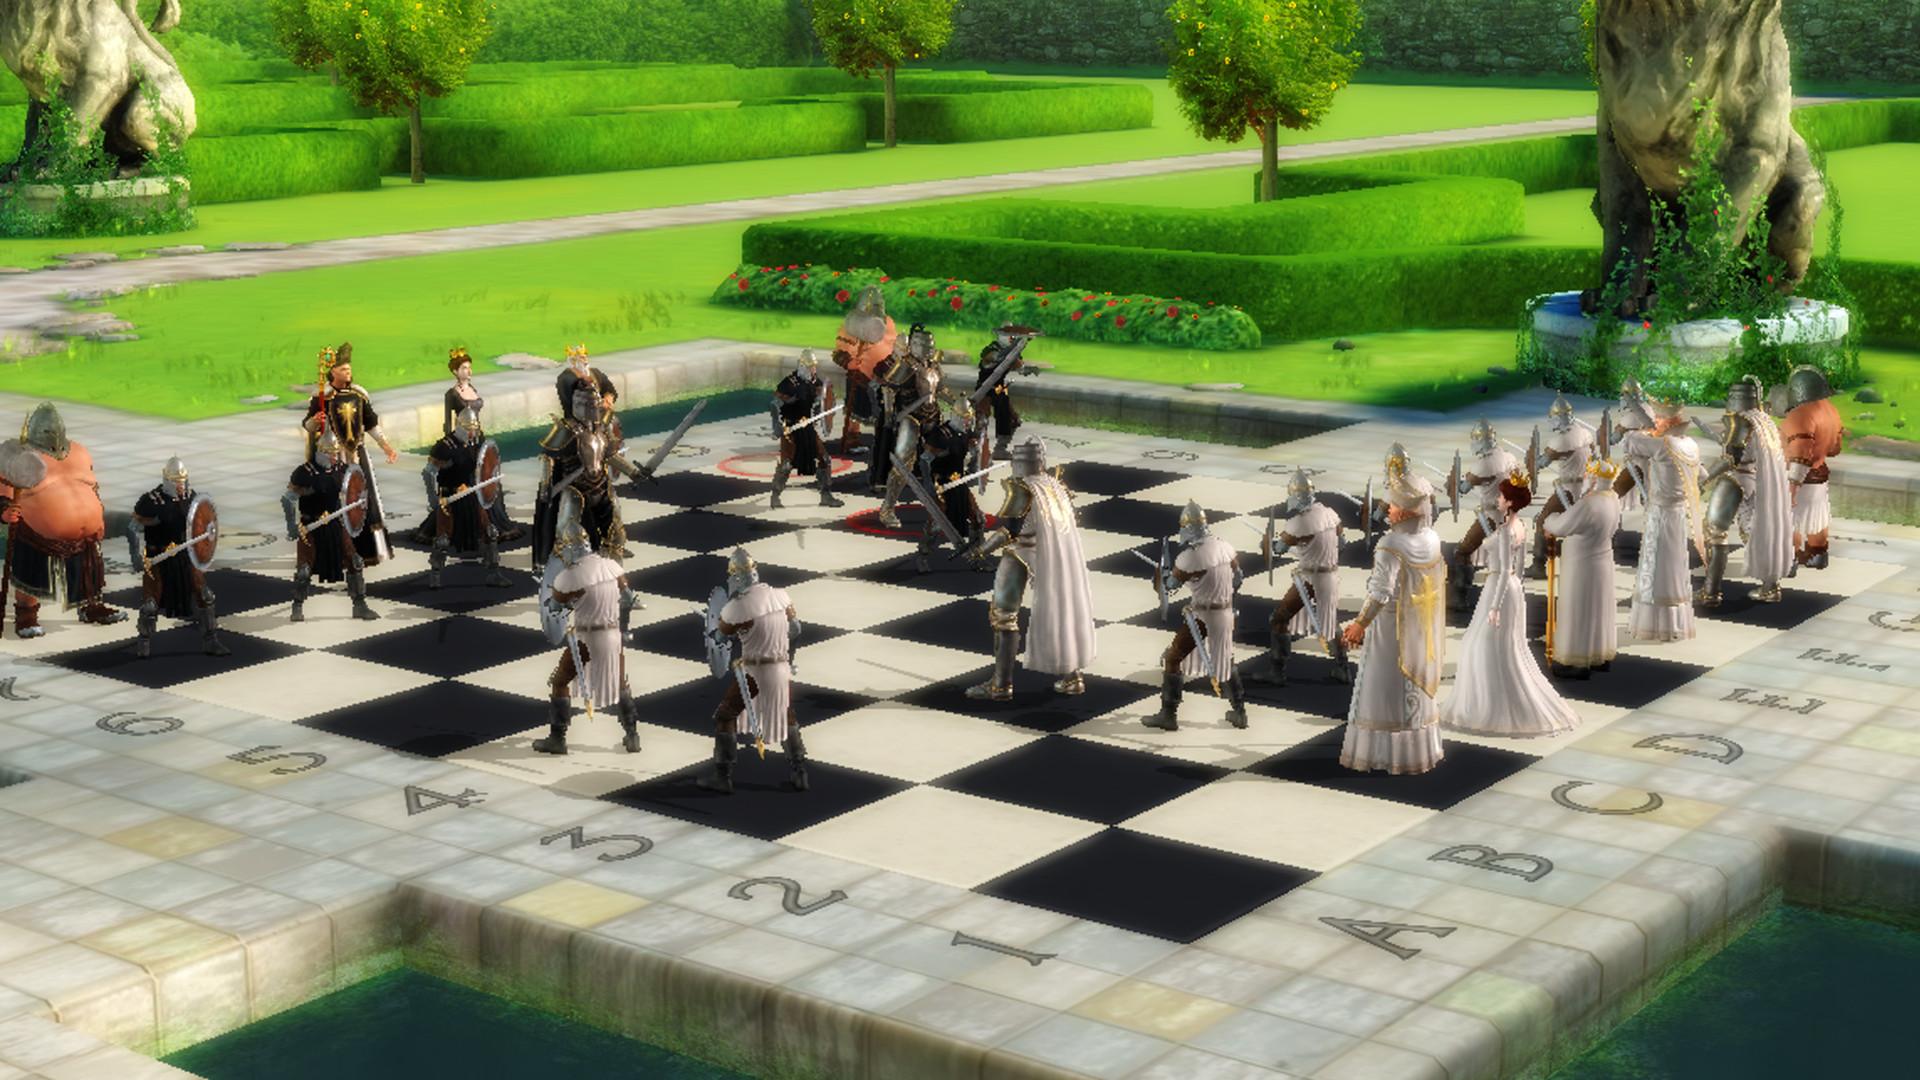 Best Chess games per platform